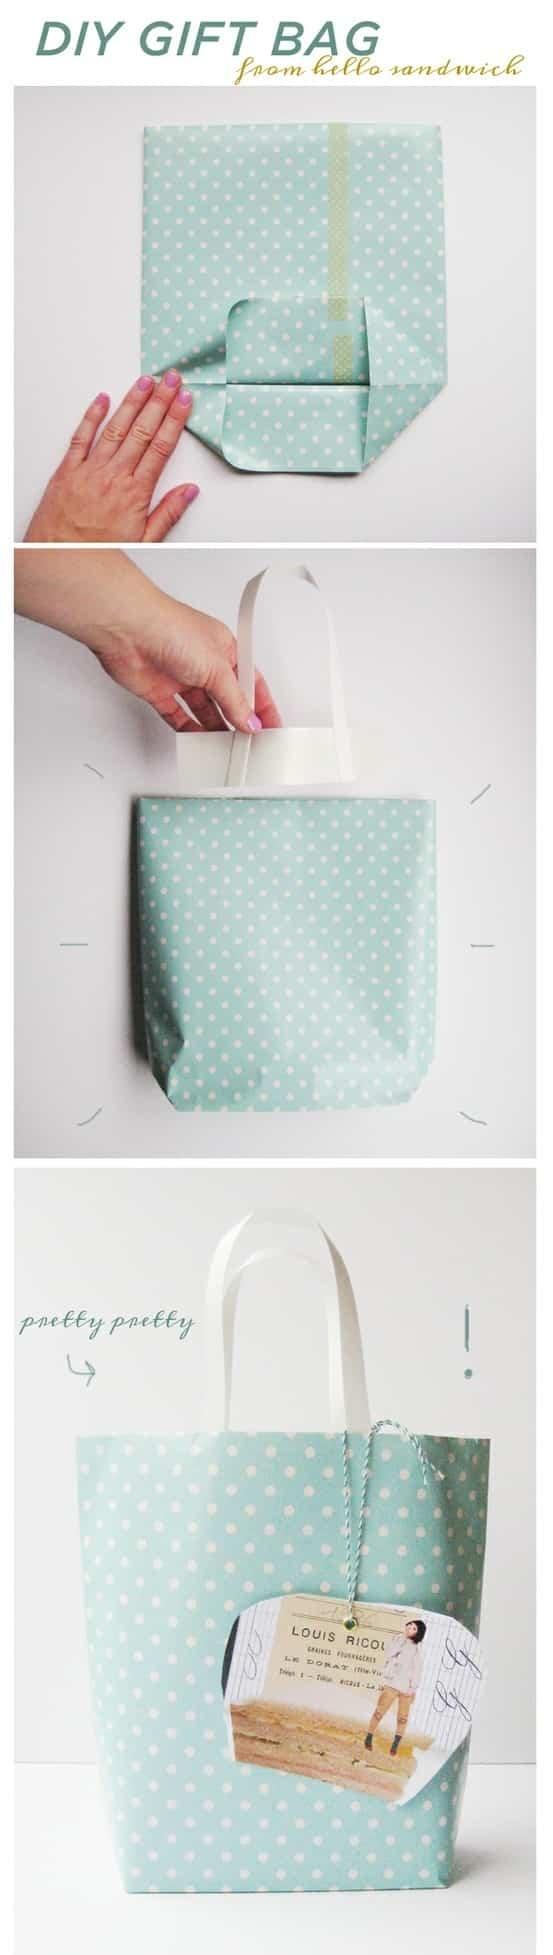 31 creative and useful diy gift wrapping ideas designbump